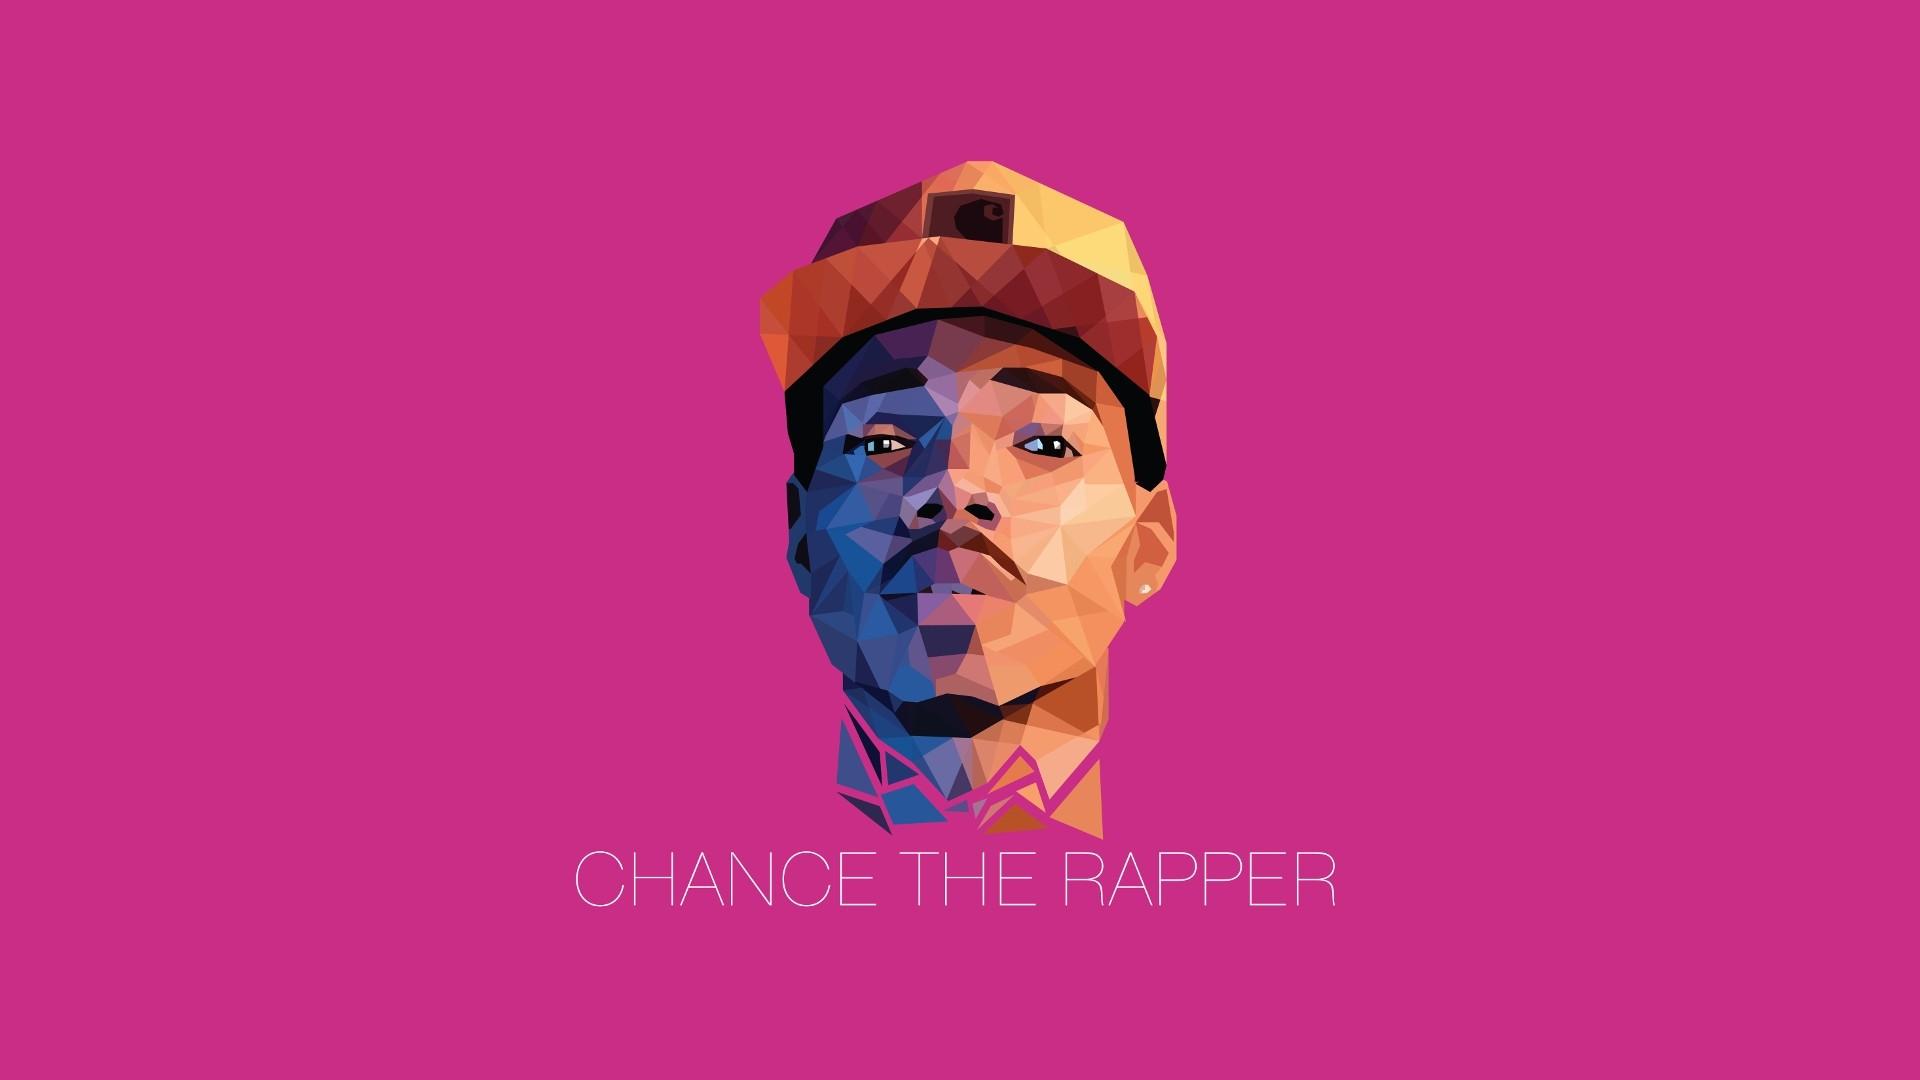 Chance The Rapper Desktop wallpaper